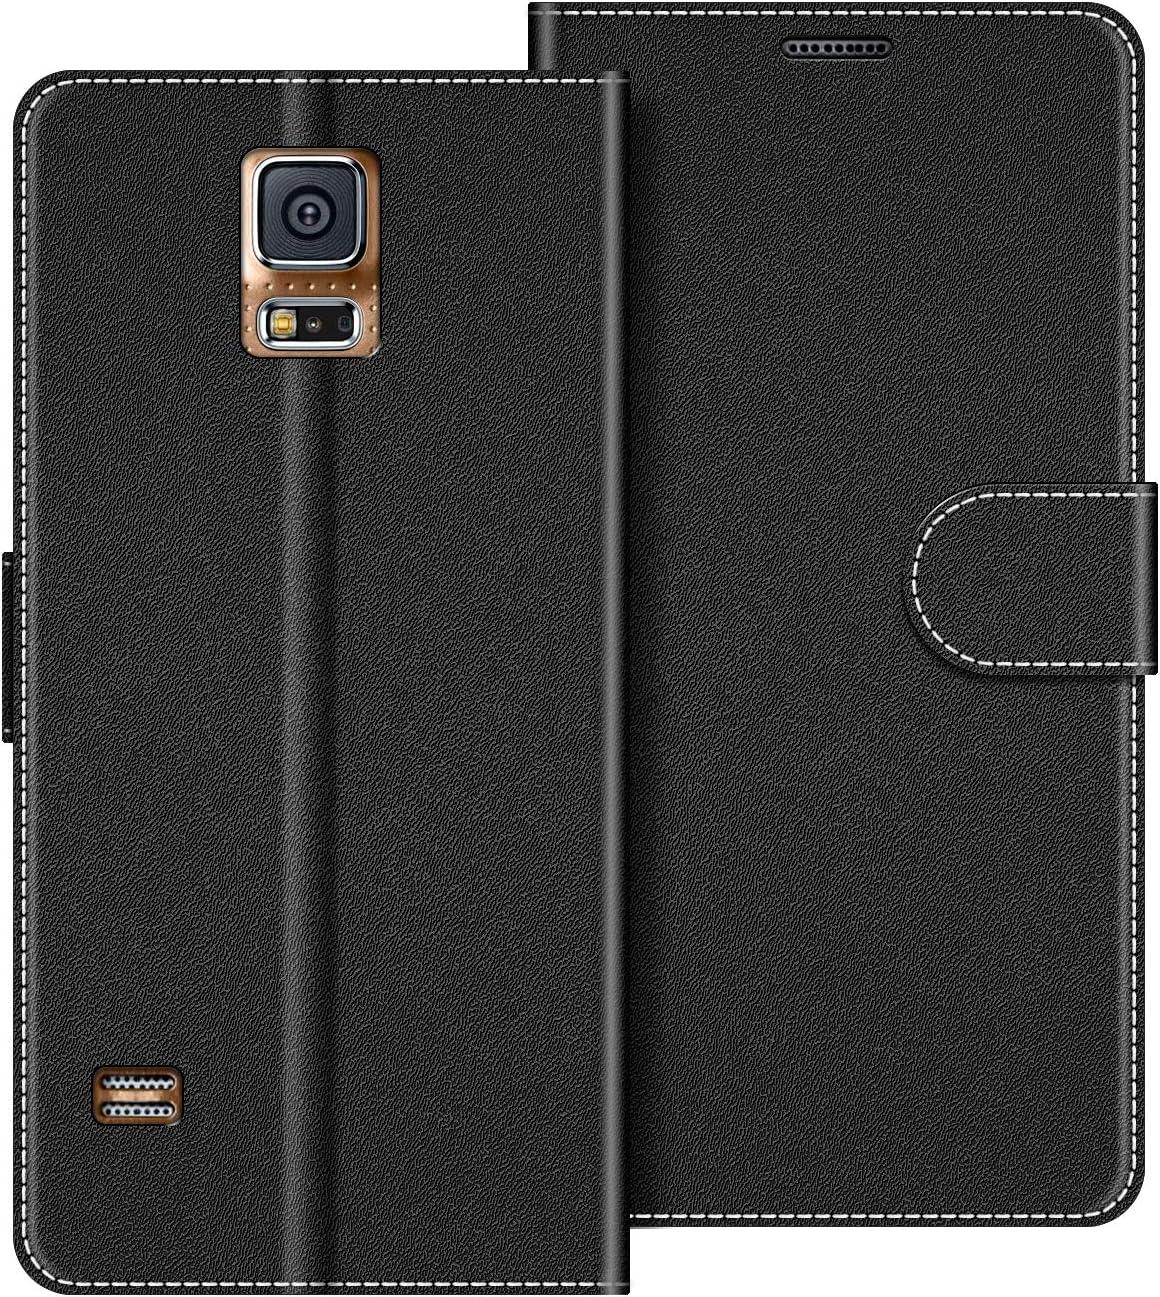 COODIO Funda Samsung Galaxy S5 con Tapa, Funda Movil Samsung S5, Funda Libro Galaxy S5 Carcasa Magnético Funda para Samsung Galaxy S5 / S5 Neo, Negro